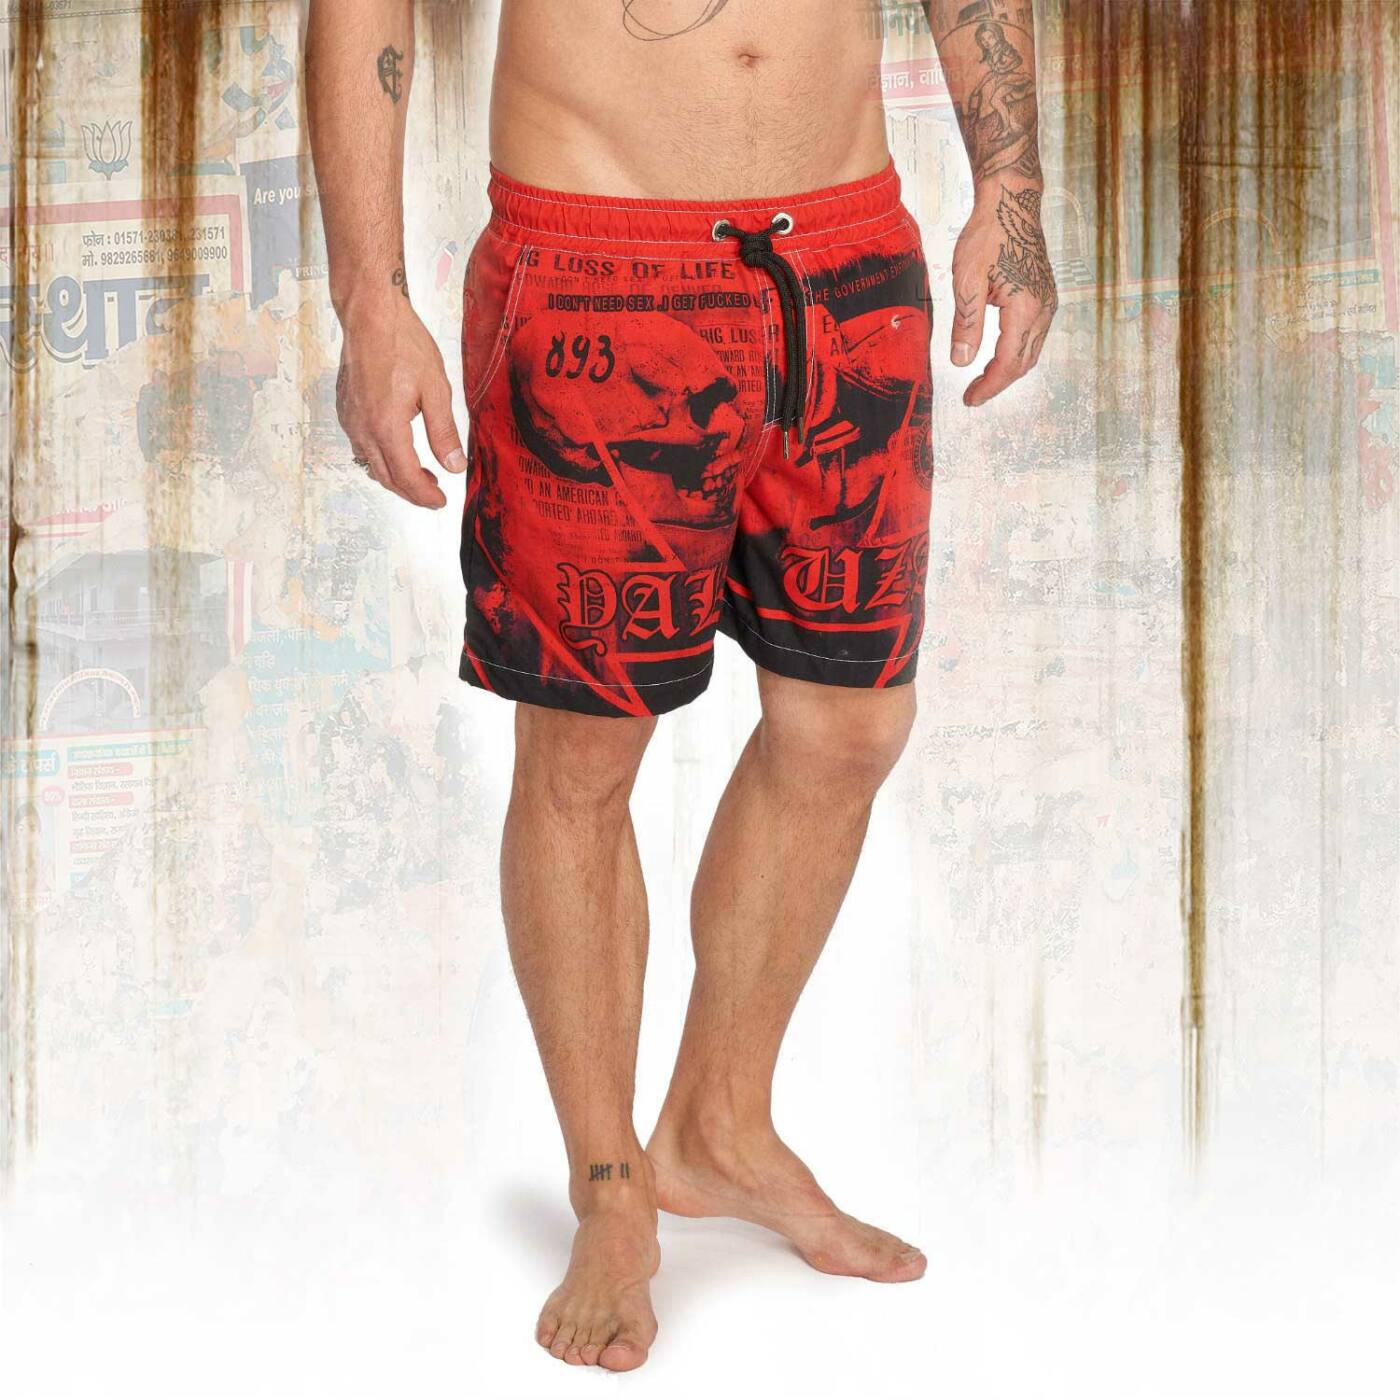 TROJAN SWIM SHORTS - Swimshorts 9ce9f0b5cf